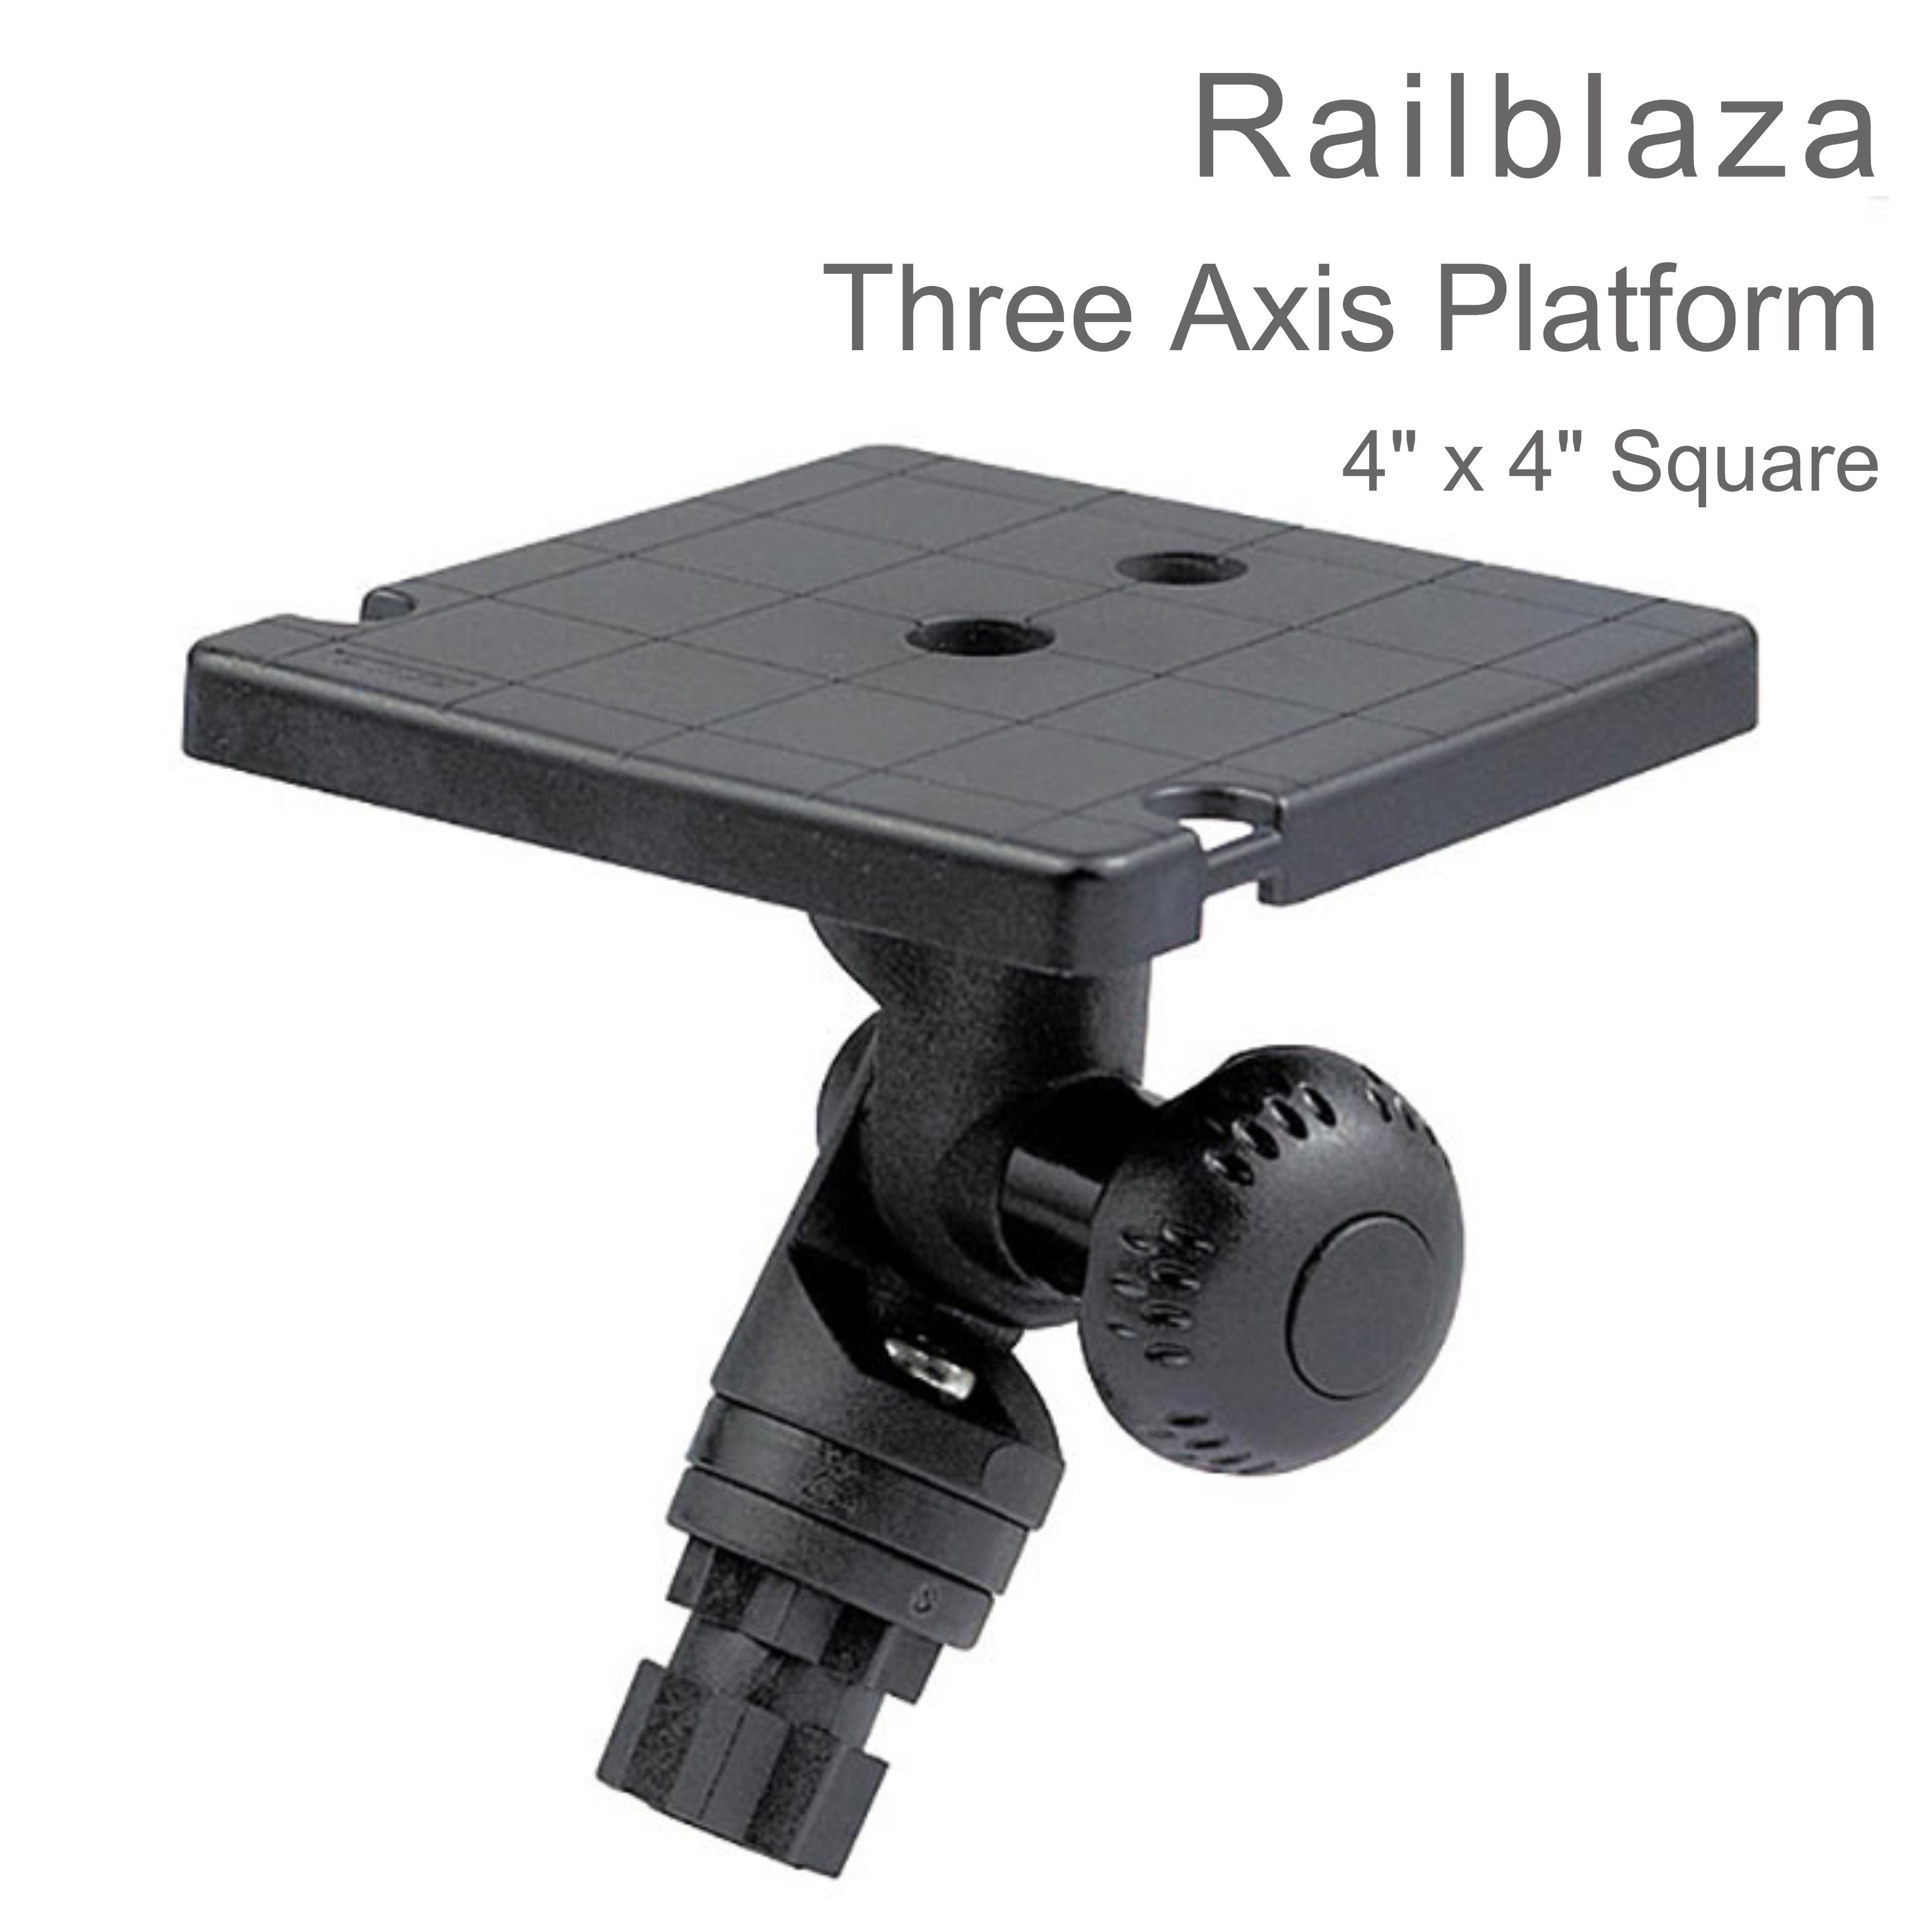 "Railblaza Three Axis Rotating Platform -  4""x4"" Square | Kayak & Boat Accessories"